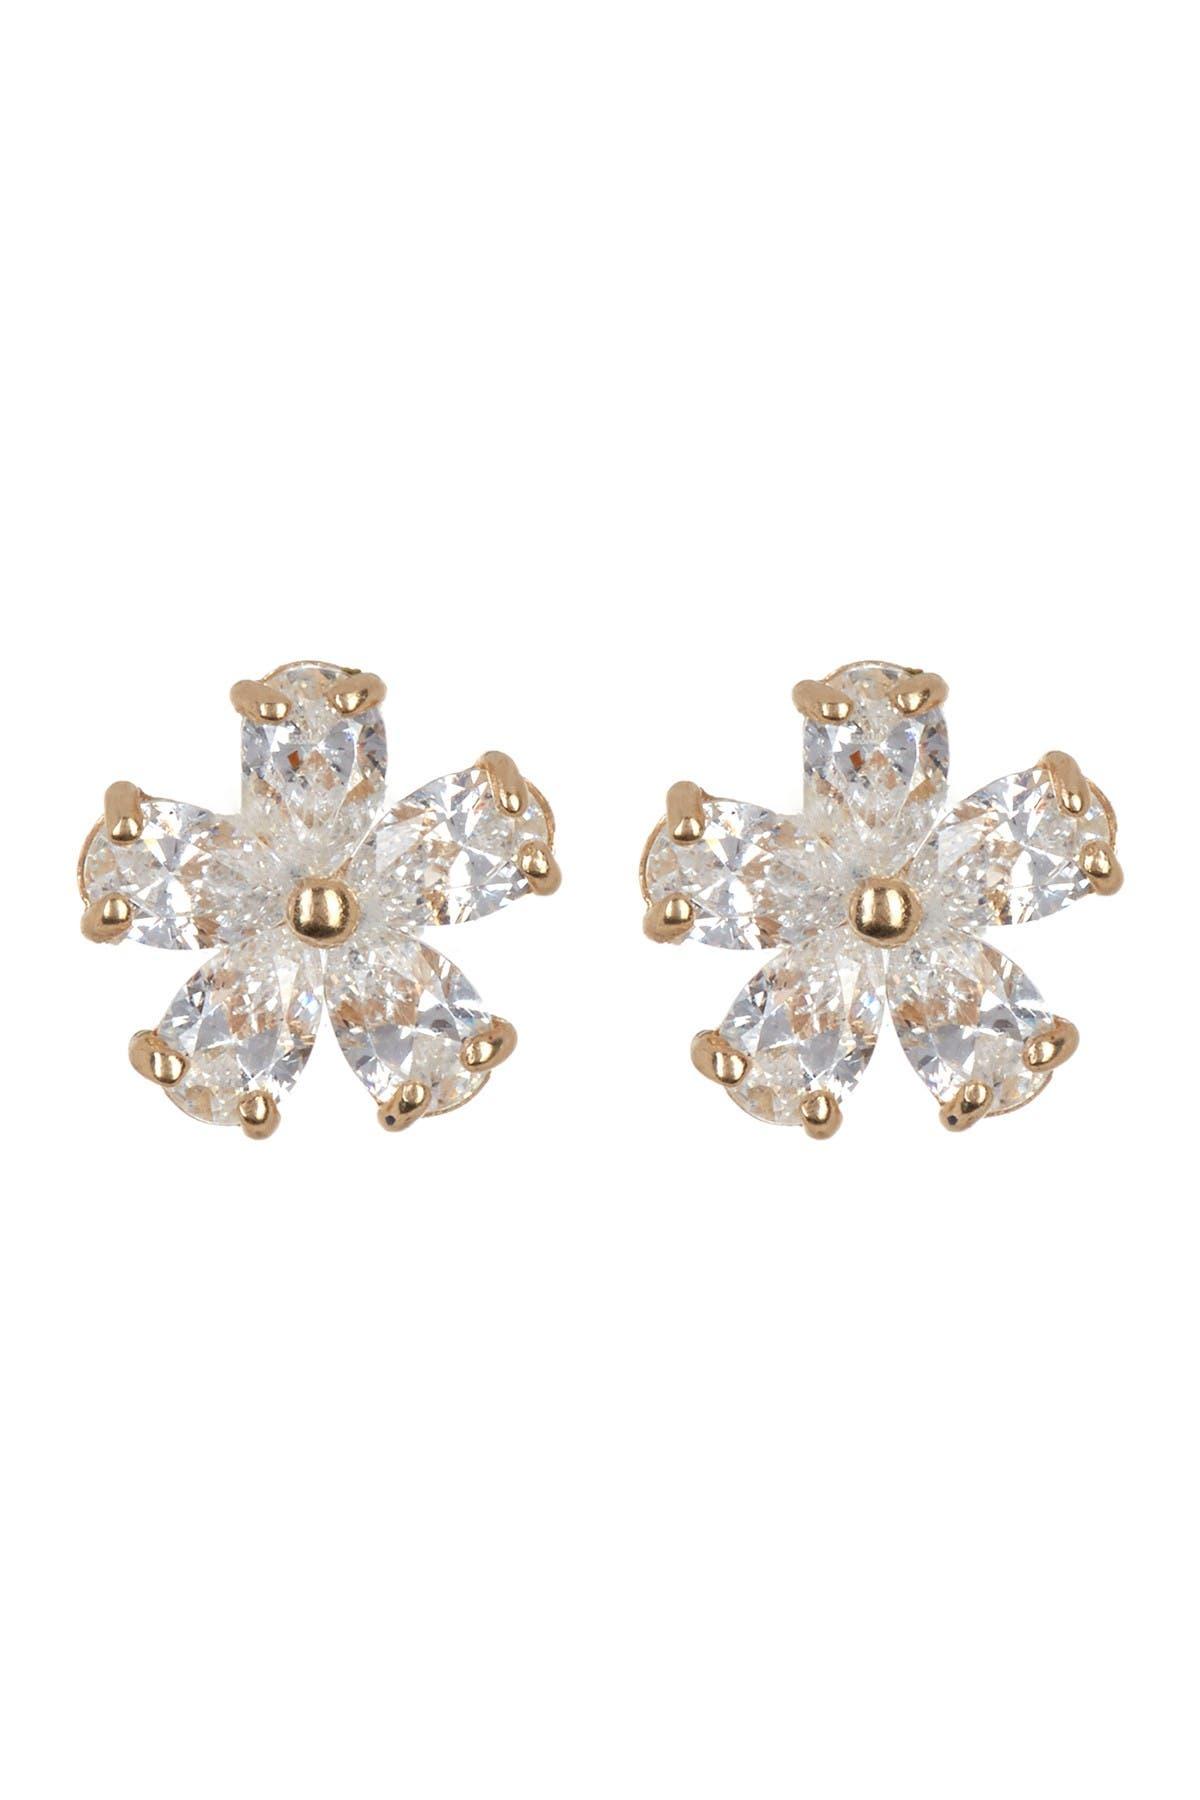 Image of Candela 14K Yellow Gold Swarovski CZ Flower Stud Earrings